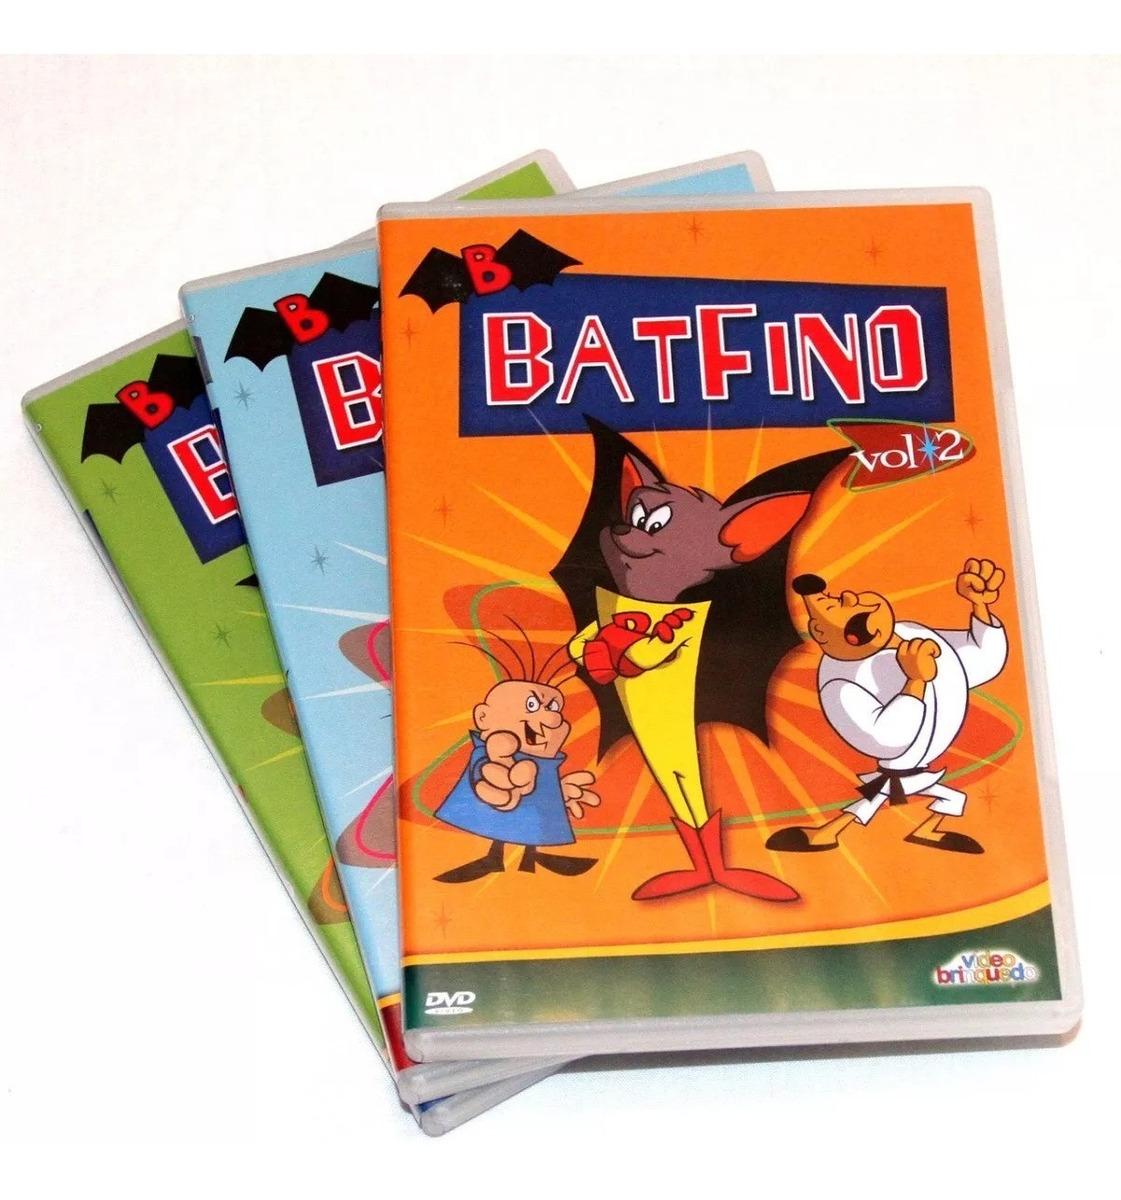 Batfino A Serie Animada Completa Dvd Segue Capa E Estojo R 45